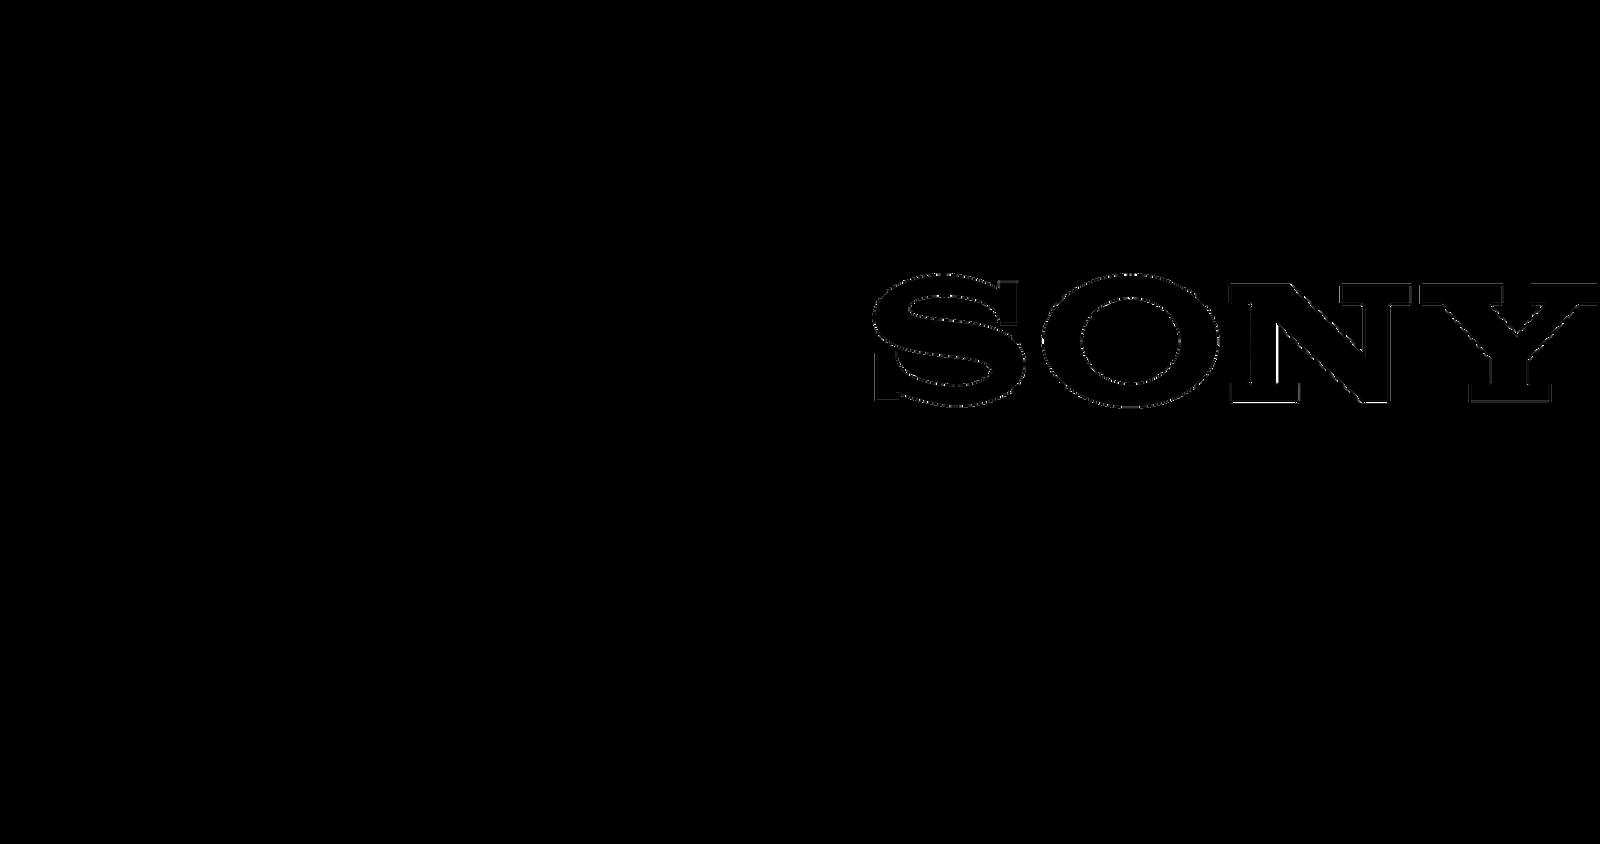 Disney Sony Home Video By Constantinchiselhoff On Deviantart